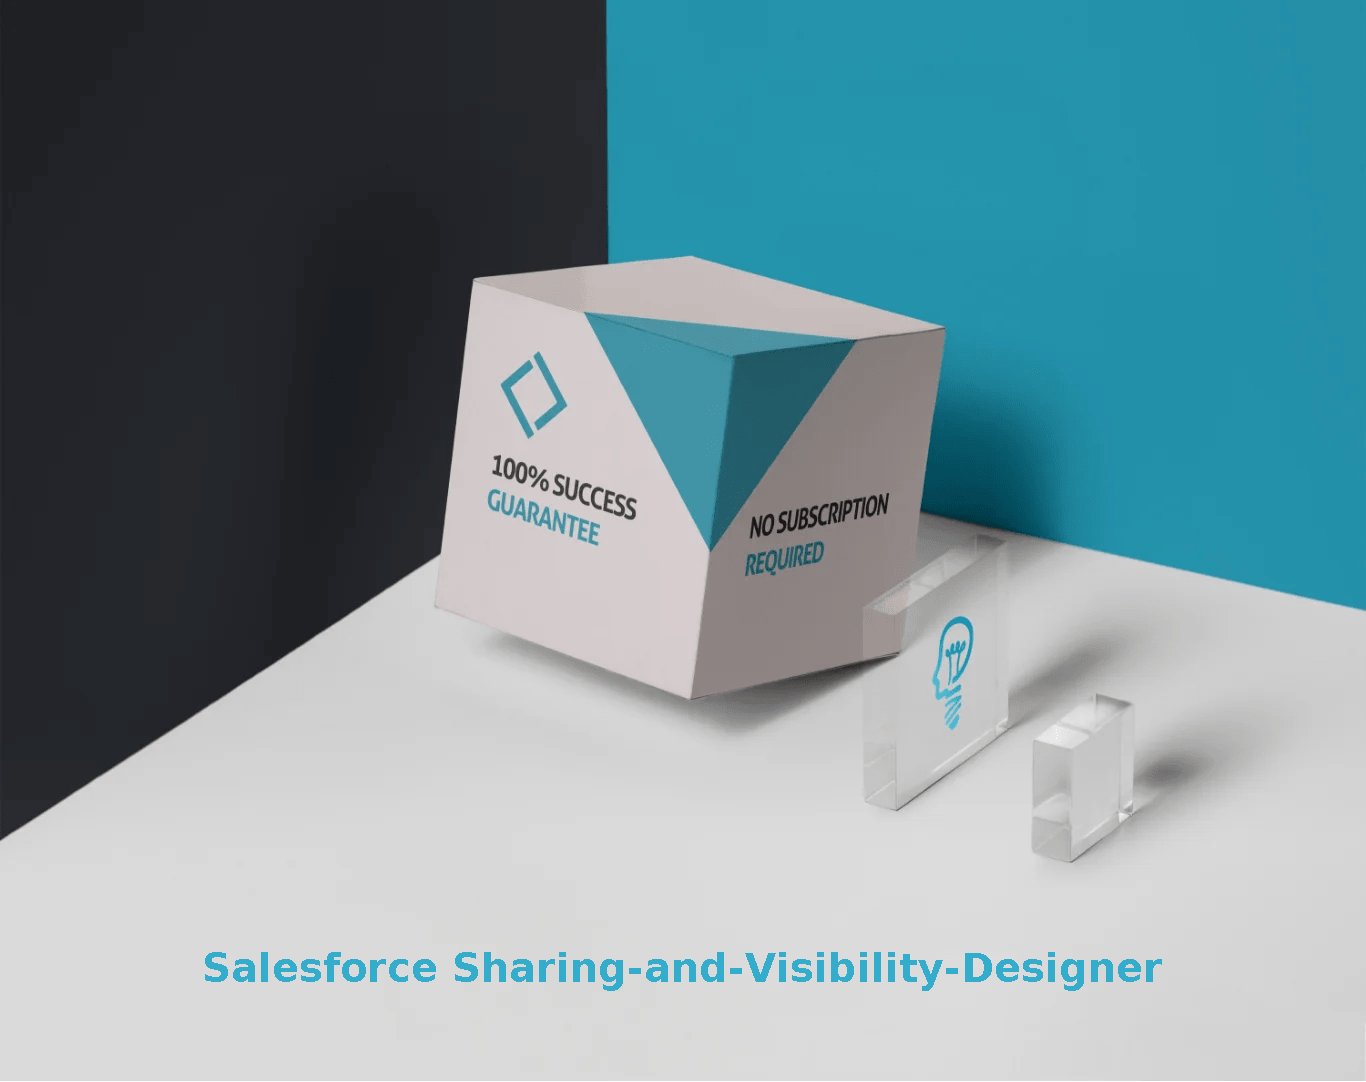 Sharing-and-Visibility-Designer Dumps